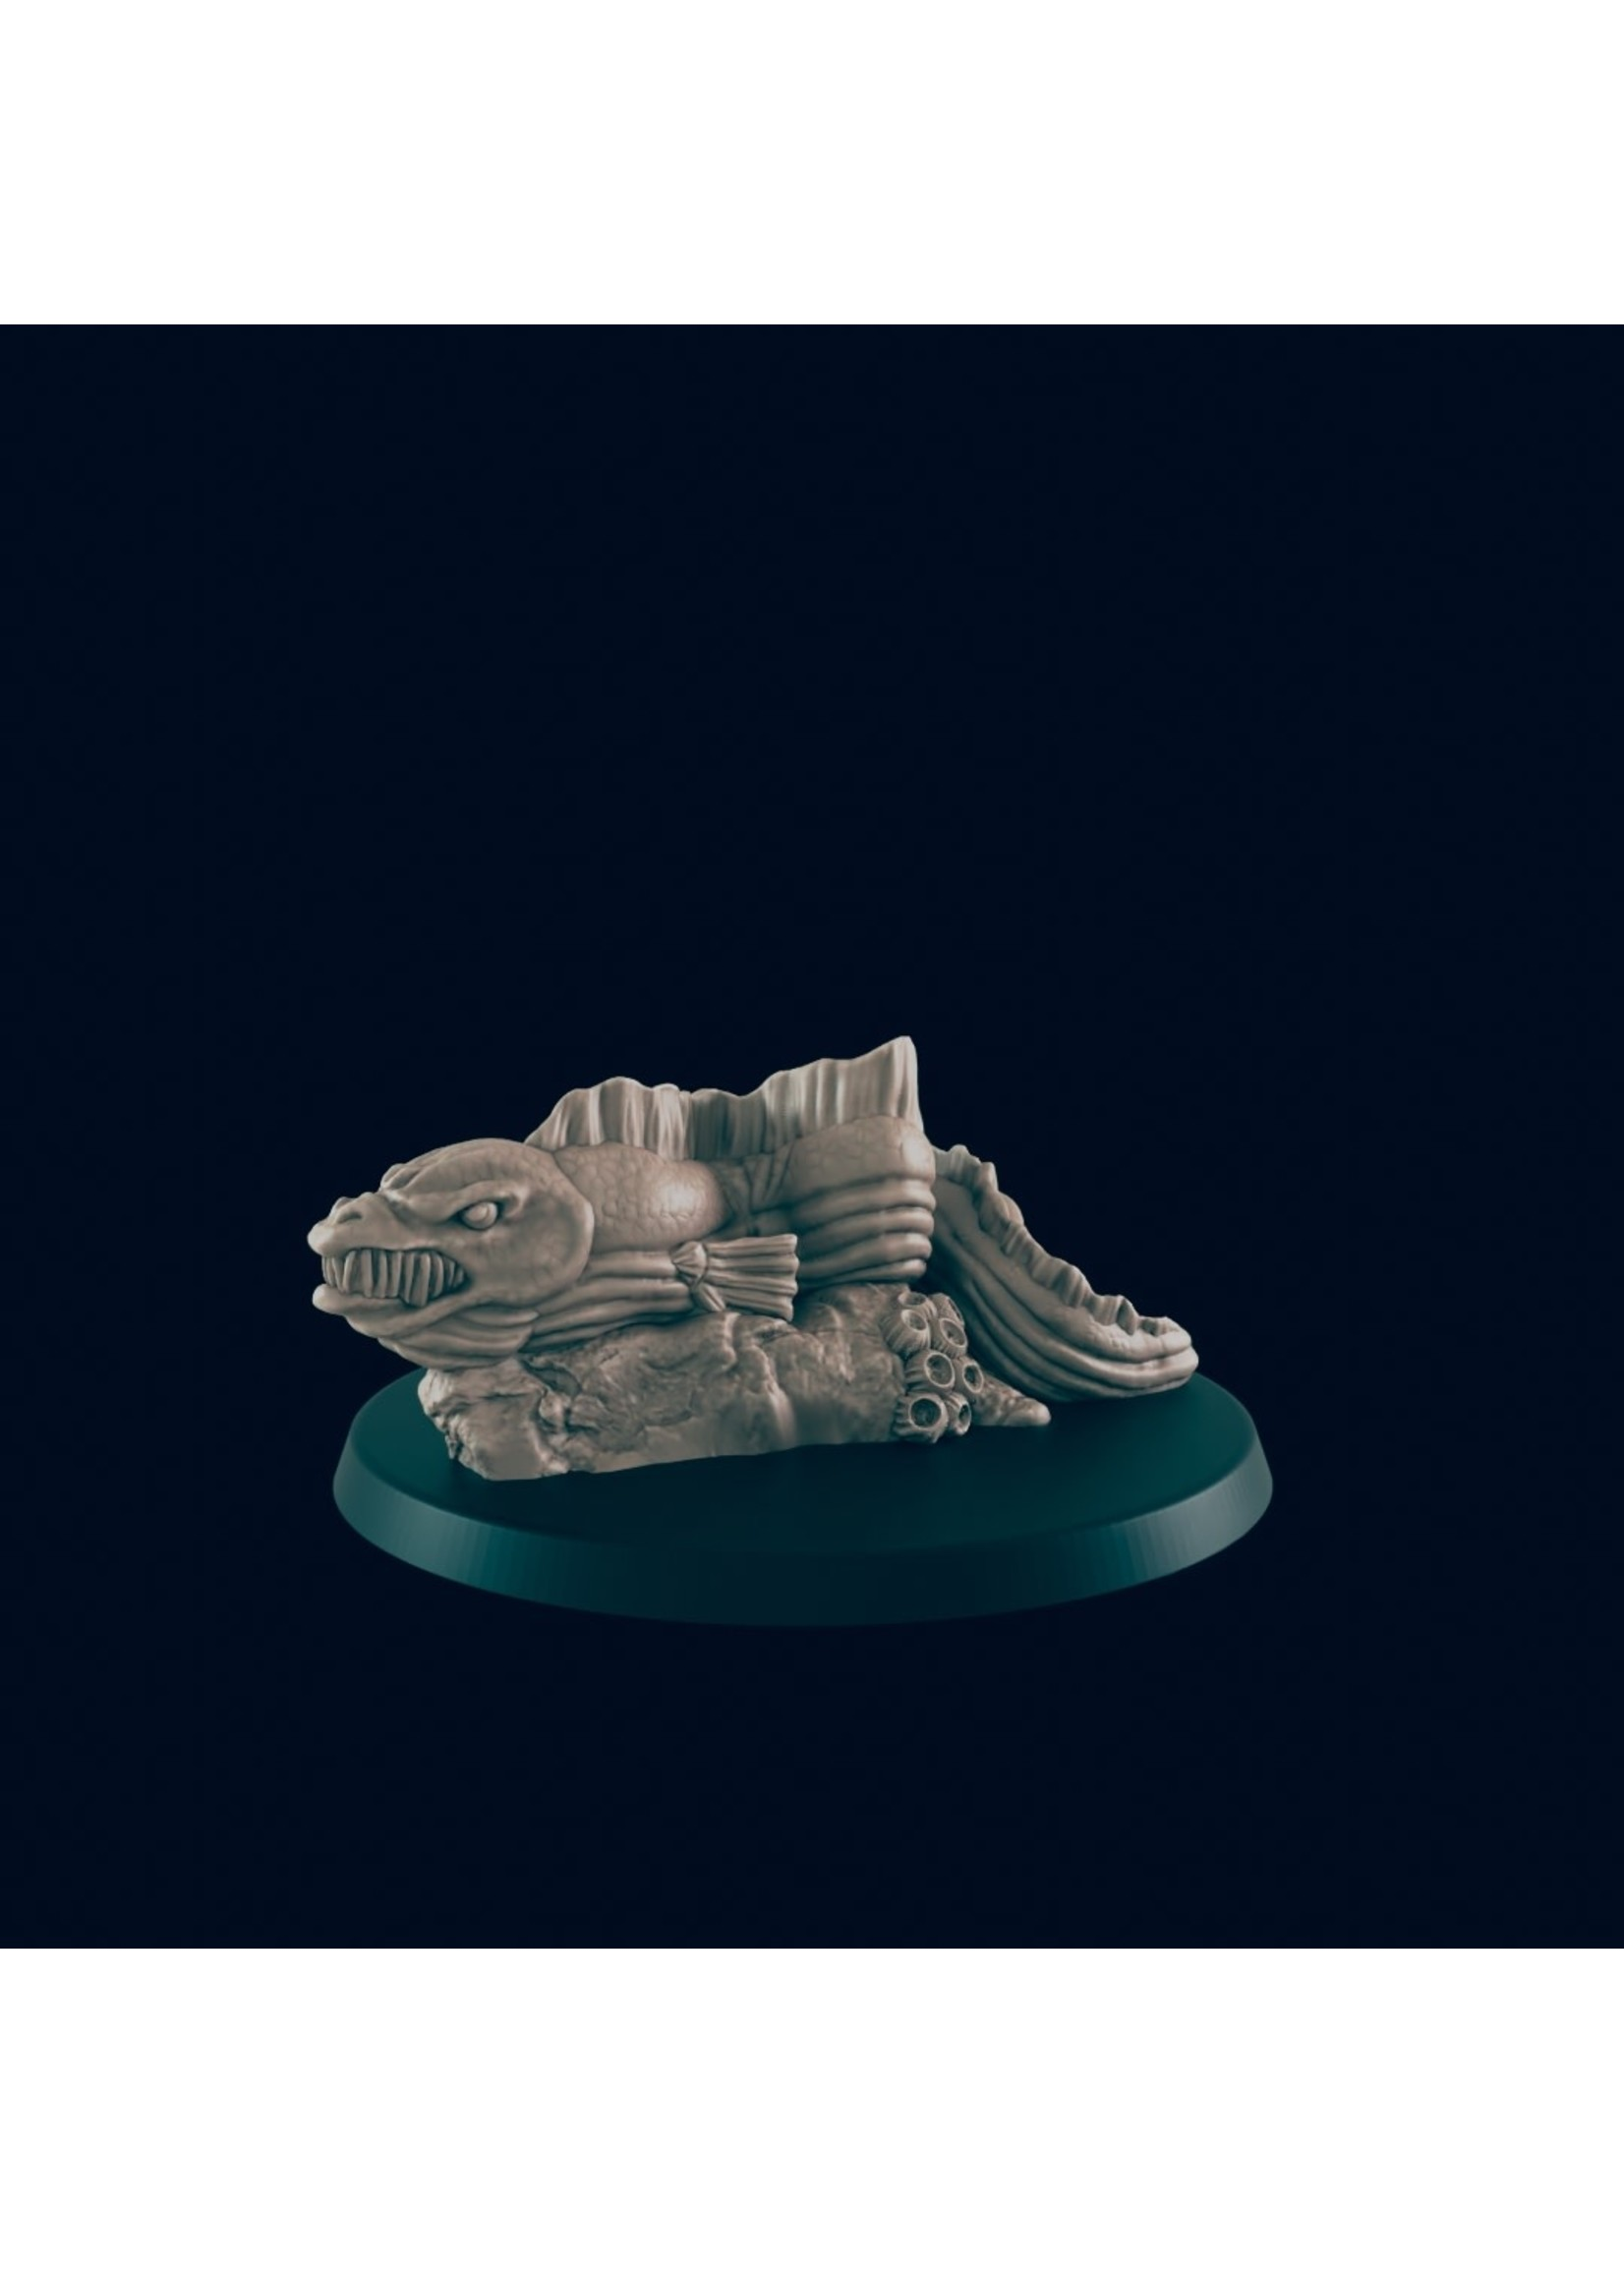 3D Printed Miniature - Giant Eel - Dungeons & Dragons - Beasts and Baddies KS